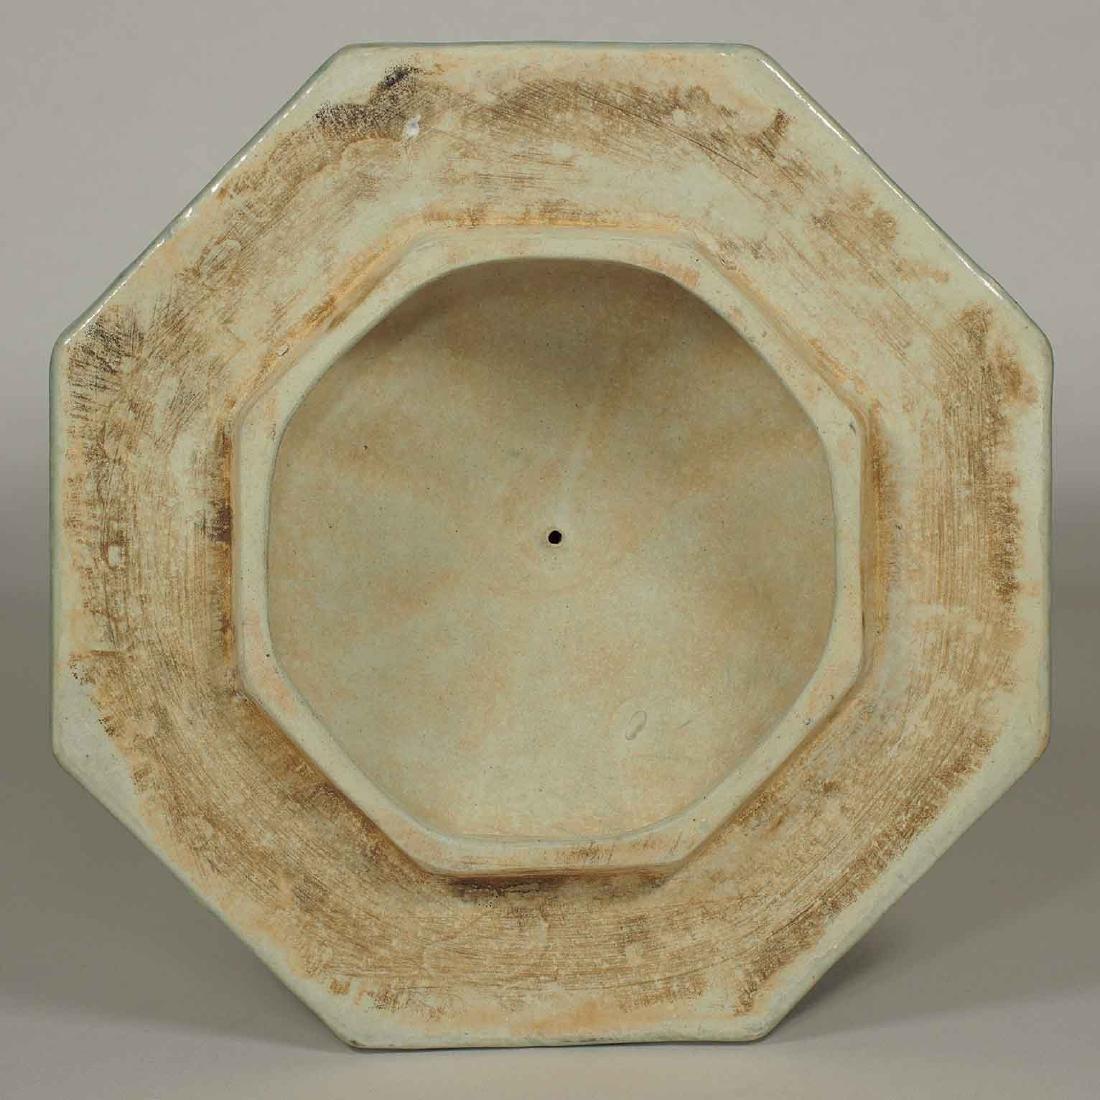 (TL) Octagonal Lidded Jar, late Yuan-early Ming Dynasty - 7